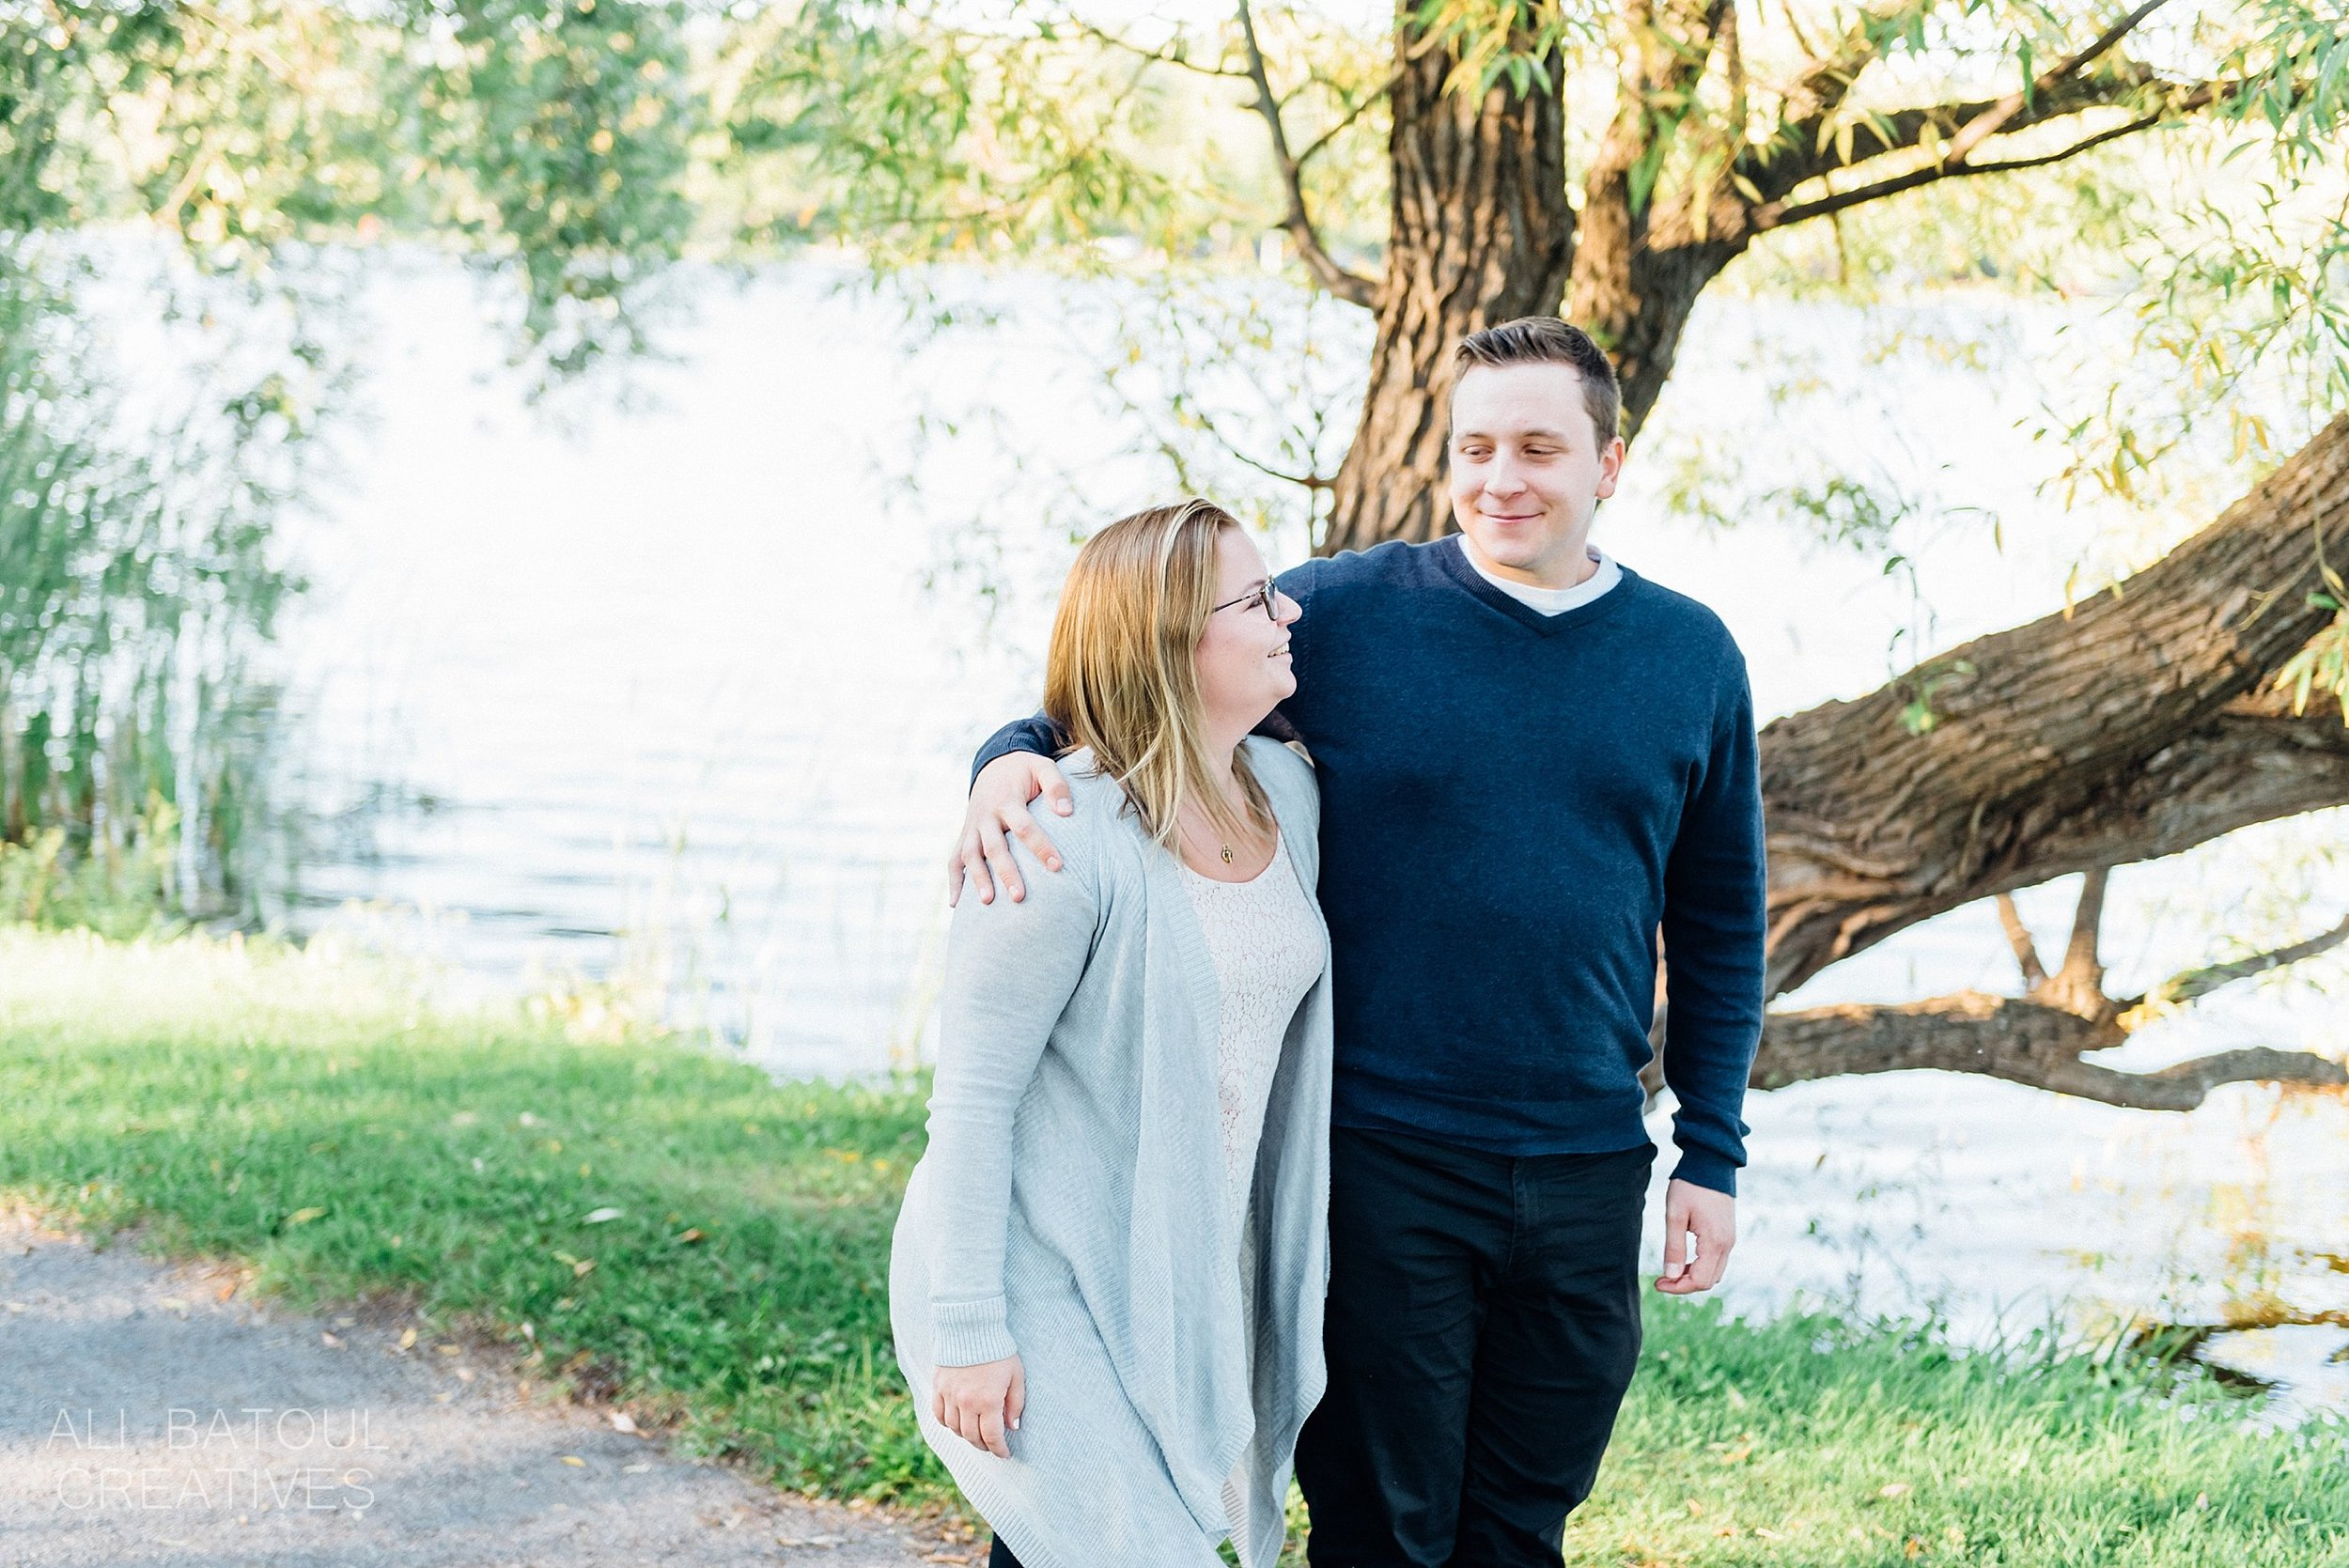 Natasha + Rich Ottawa Arboretum Engagement Photos - Ali and Batoul Fine Art Wedding Photography_0005.jpg